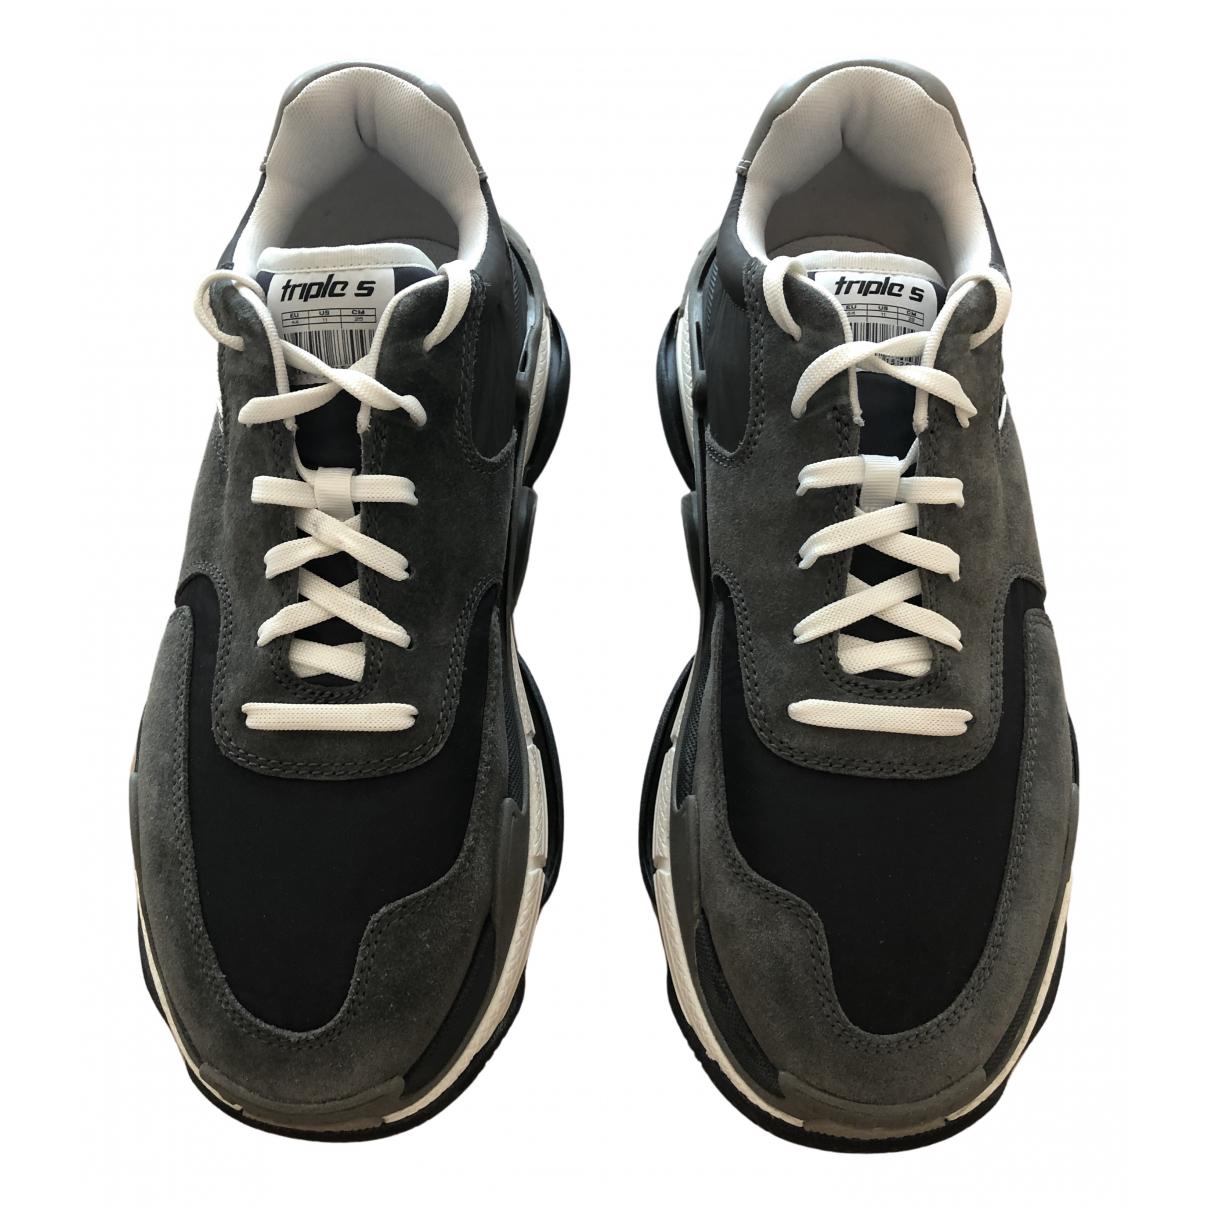 Balenciaga Triple S Sneakers in  Anthrazit Veloursleder